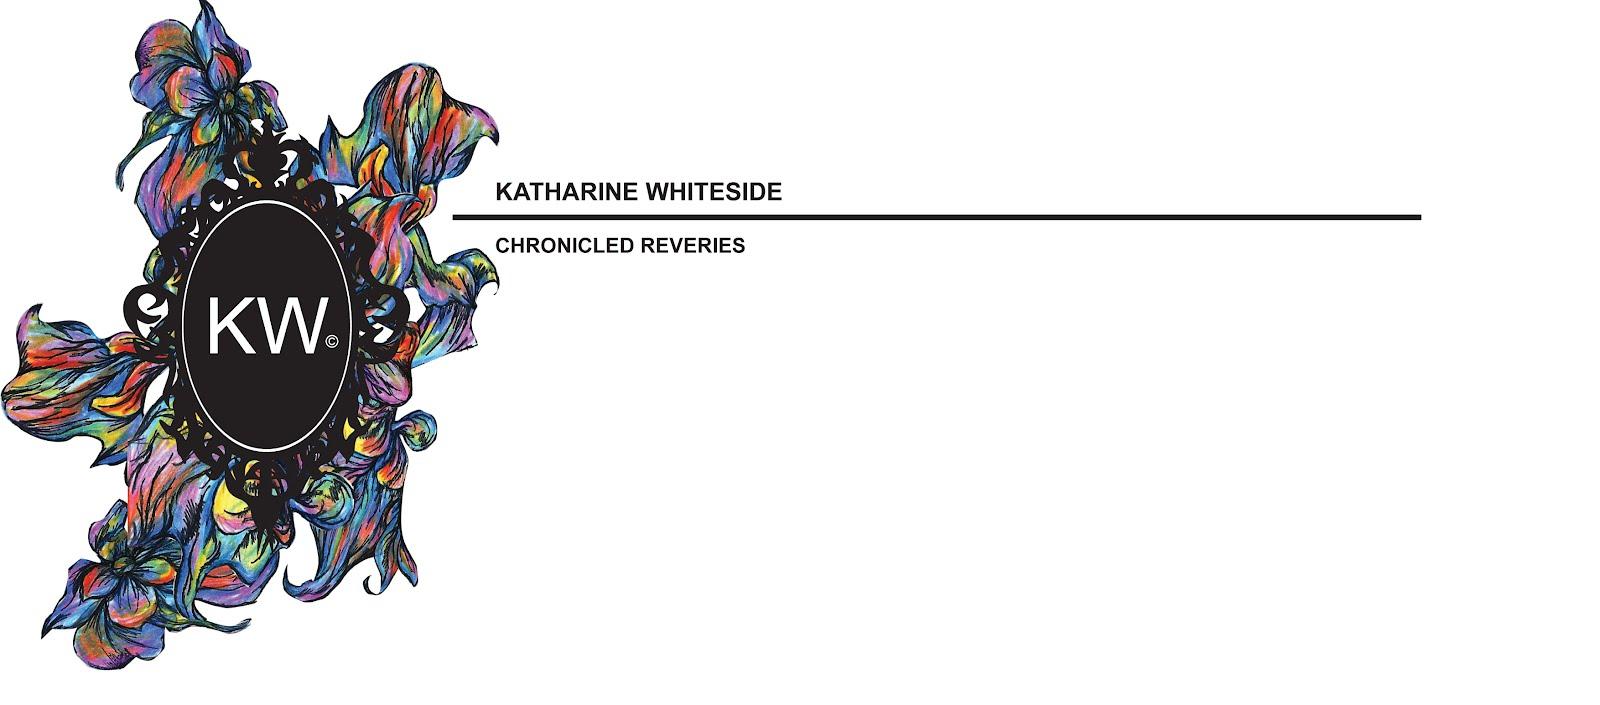 KATHARINE WHITESIDE